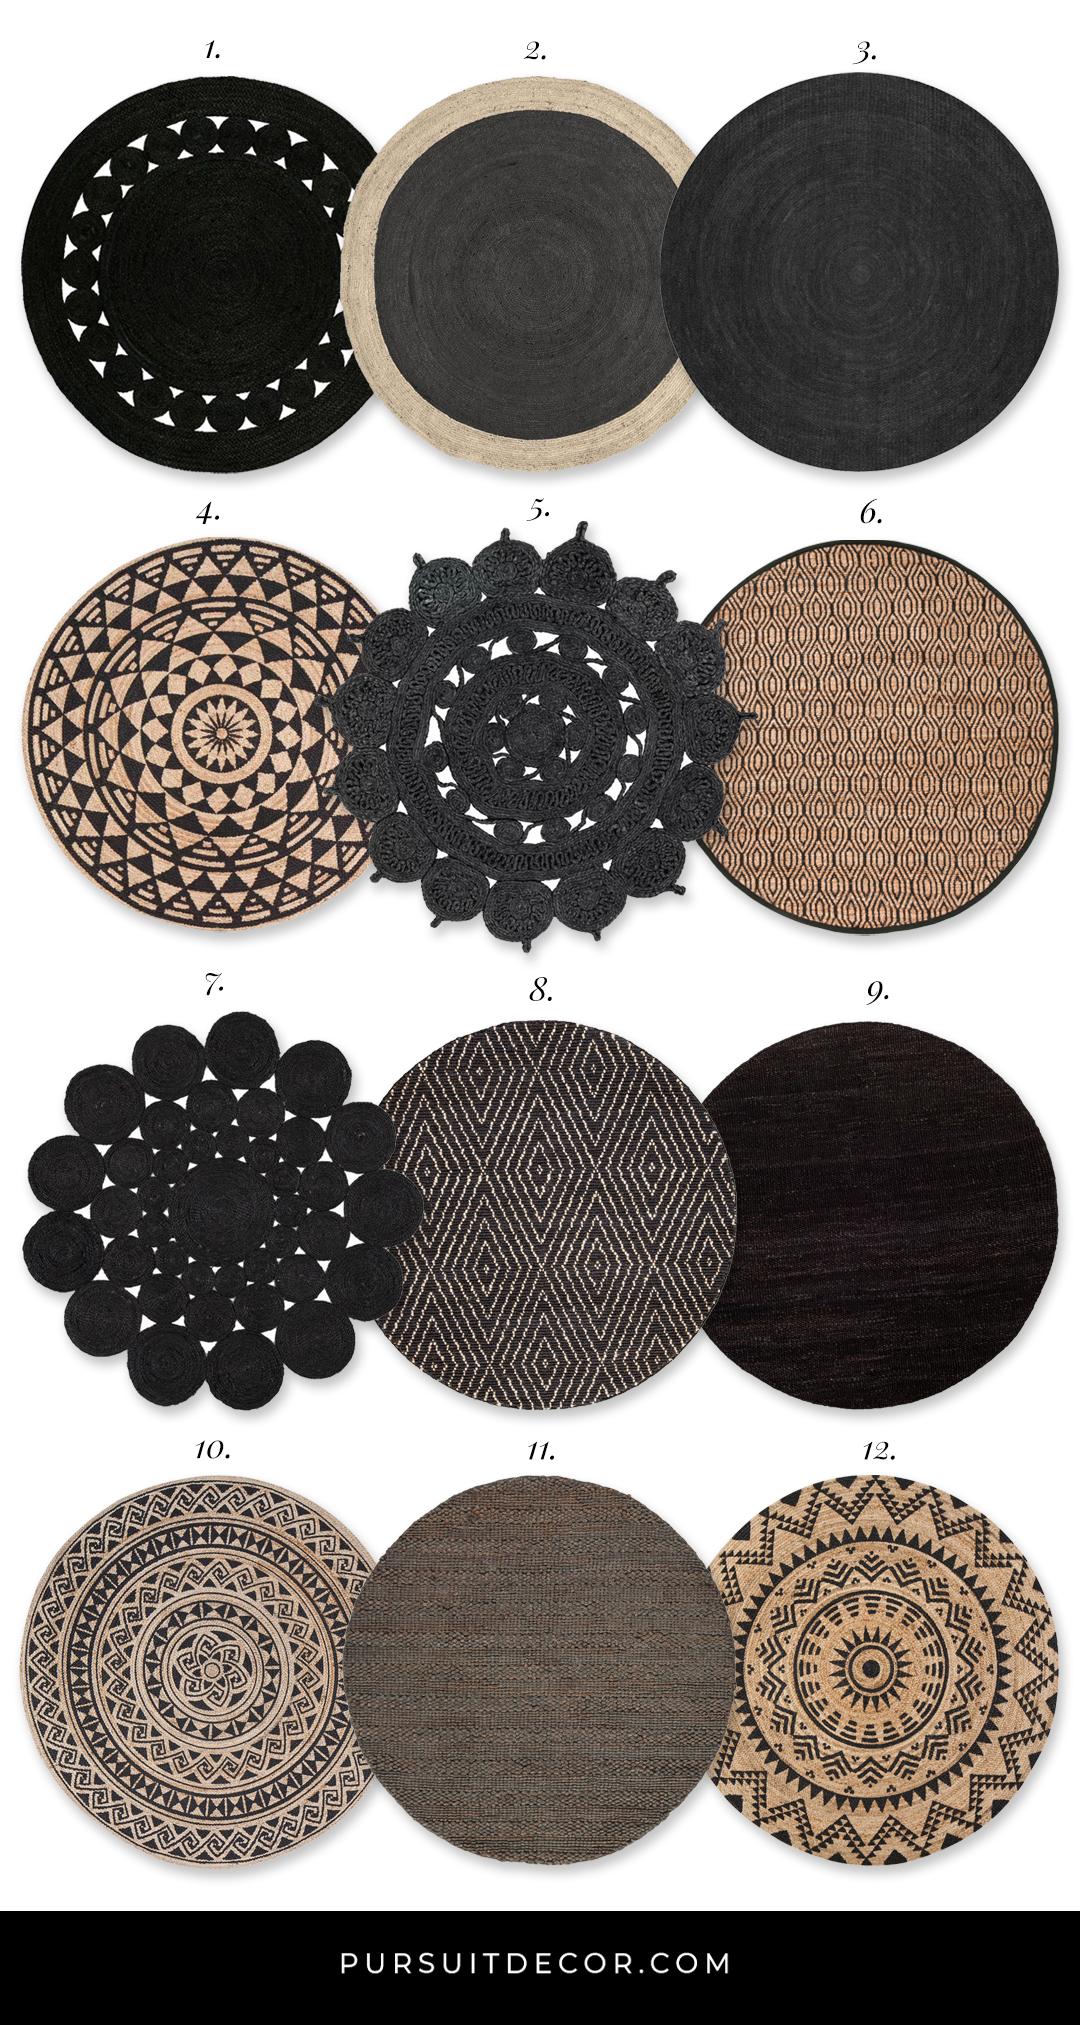 12+ Stylish Round Black Jute Rugs You'll Love - Pursuit Decor - Modern Bohemian area rugs, neutral textured Boho rugs, jute rug, sisal rug, round Boho rugs, natural fibre floor coverings #bohochic #bohemiandecor #bohorug